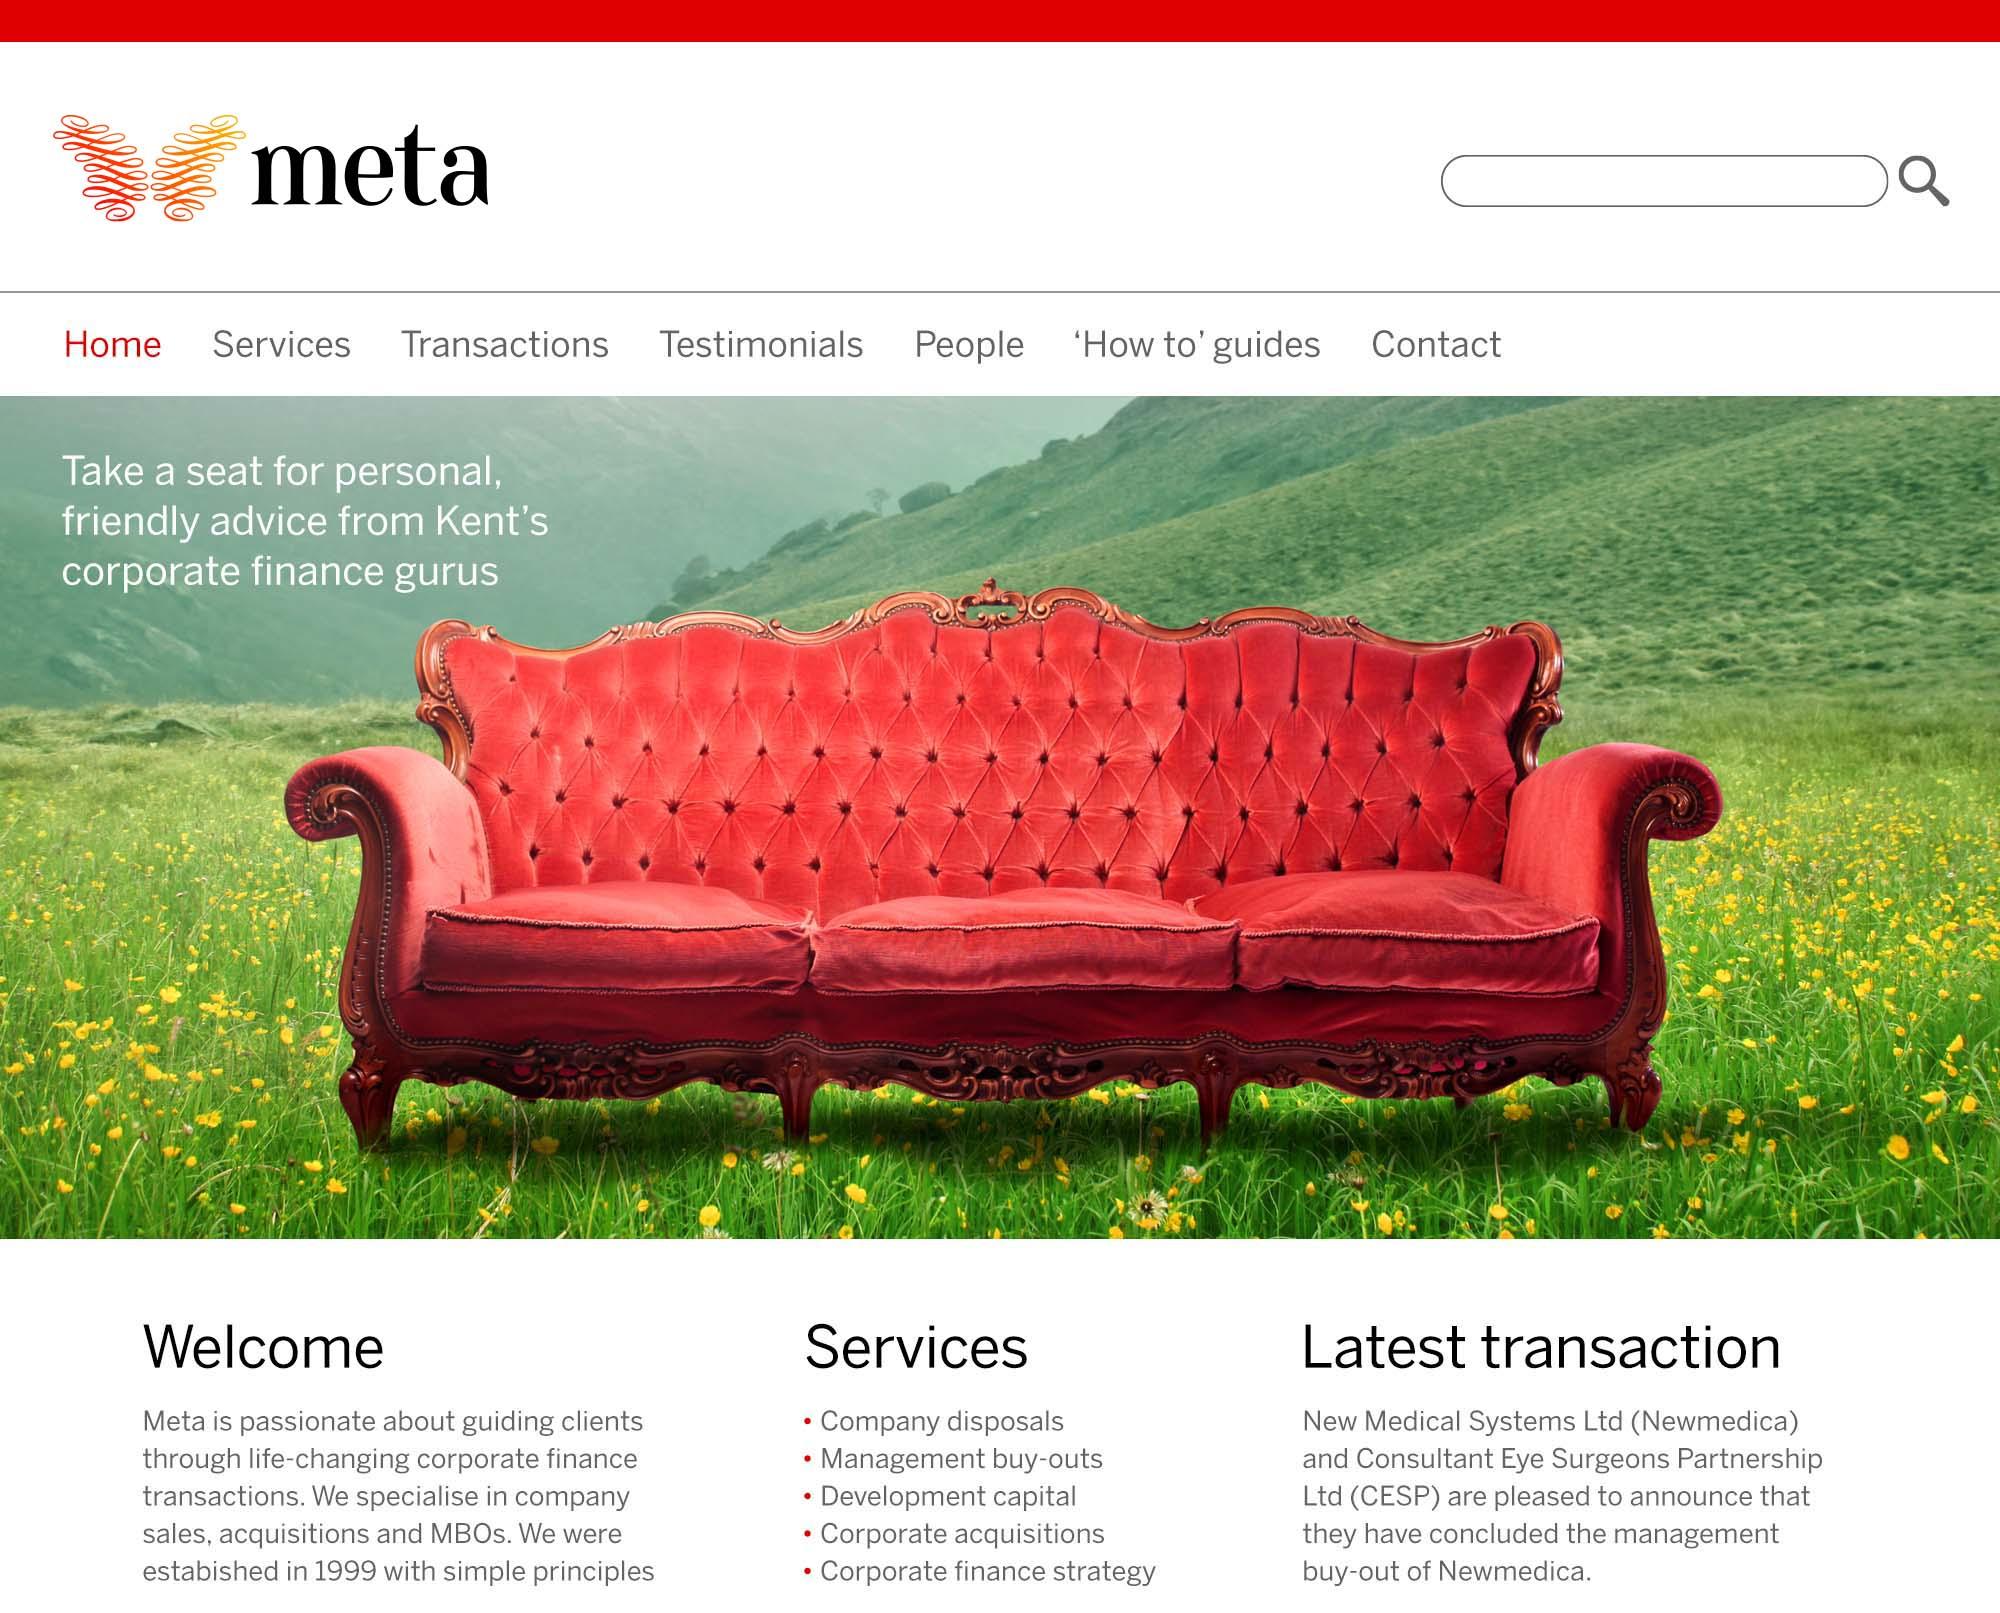 Meta website design